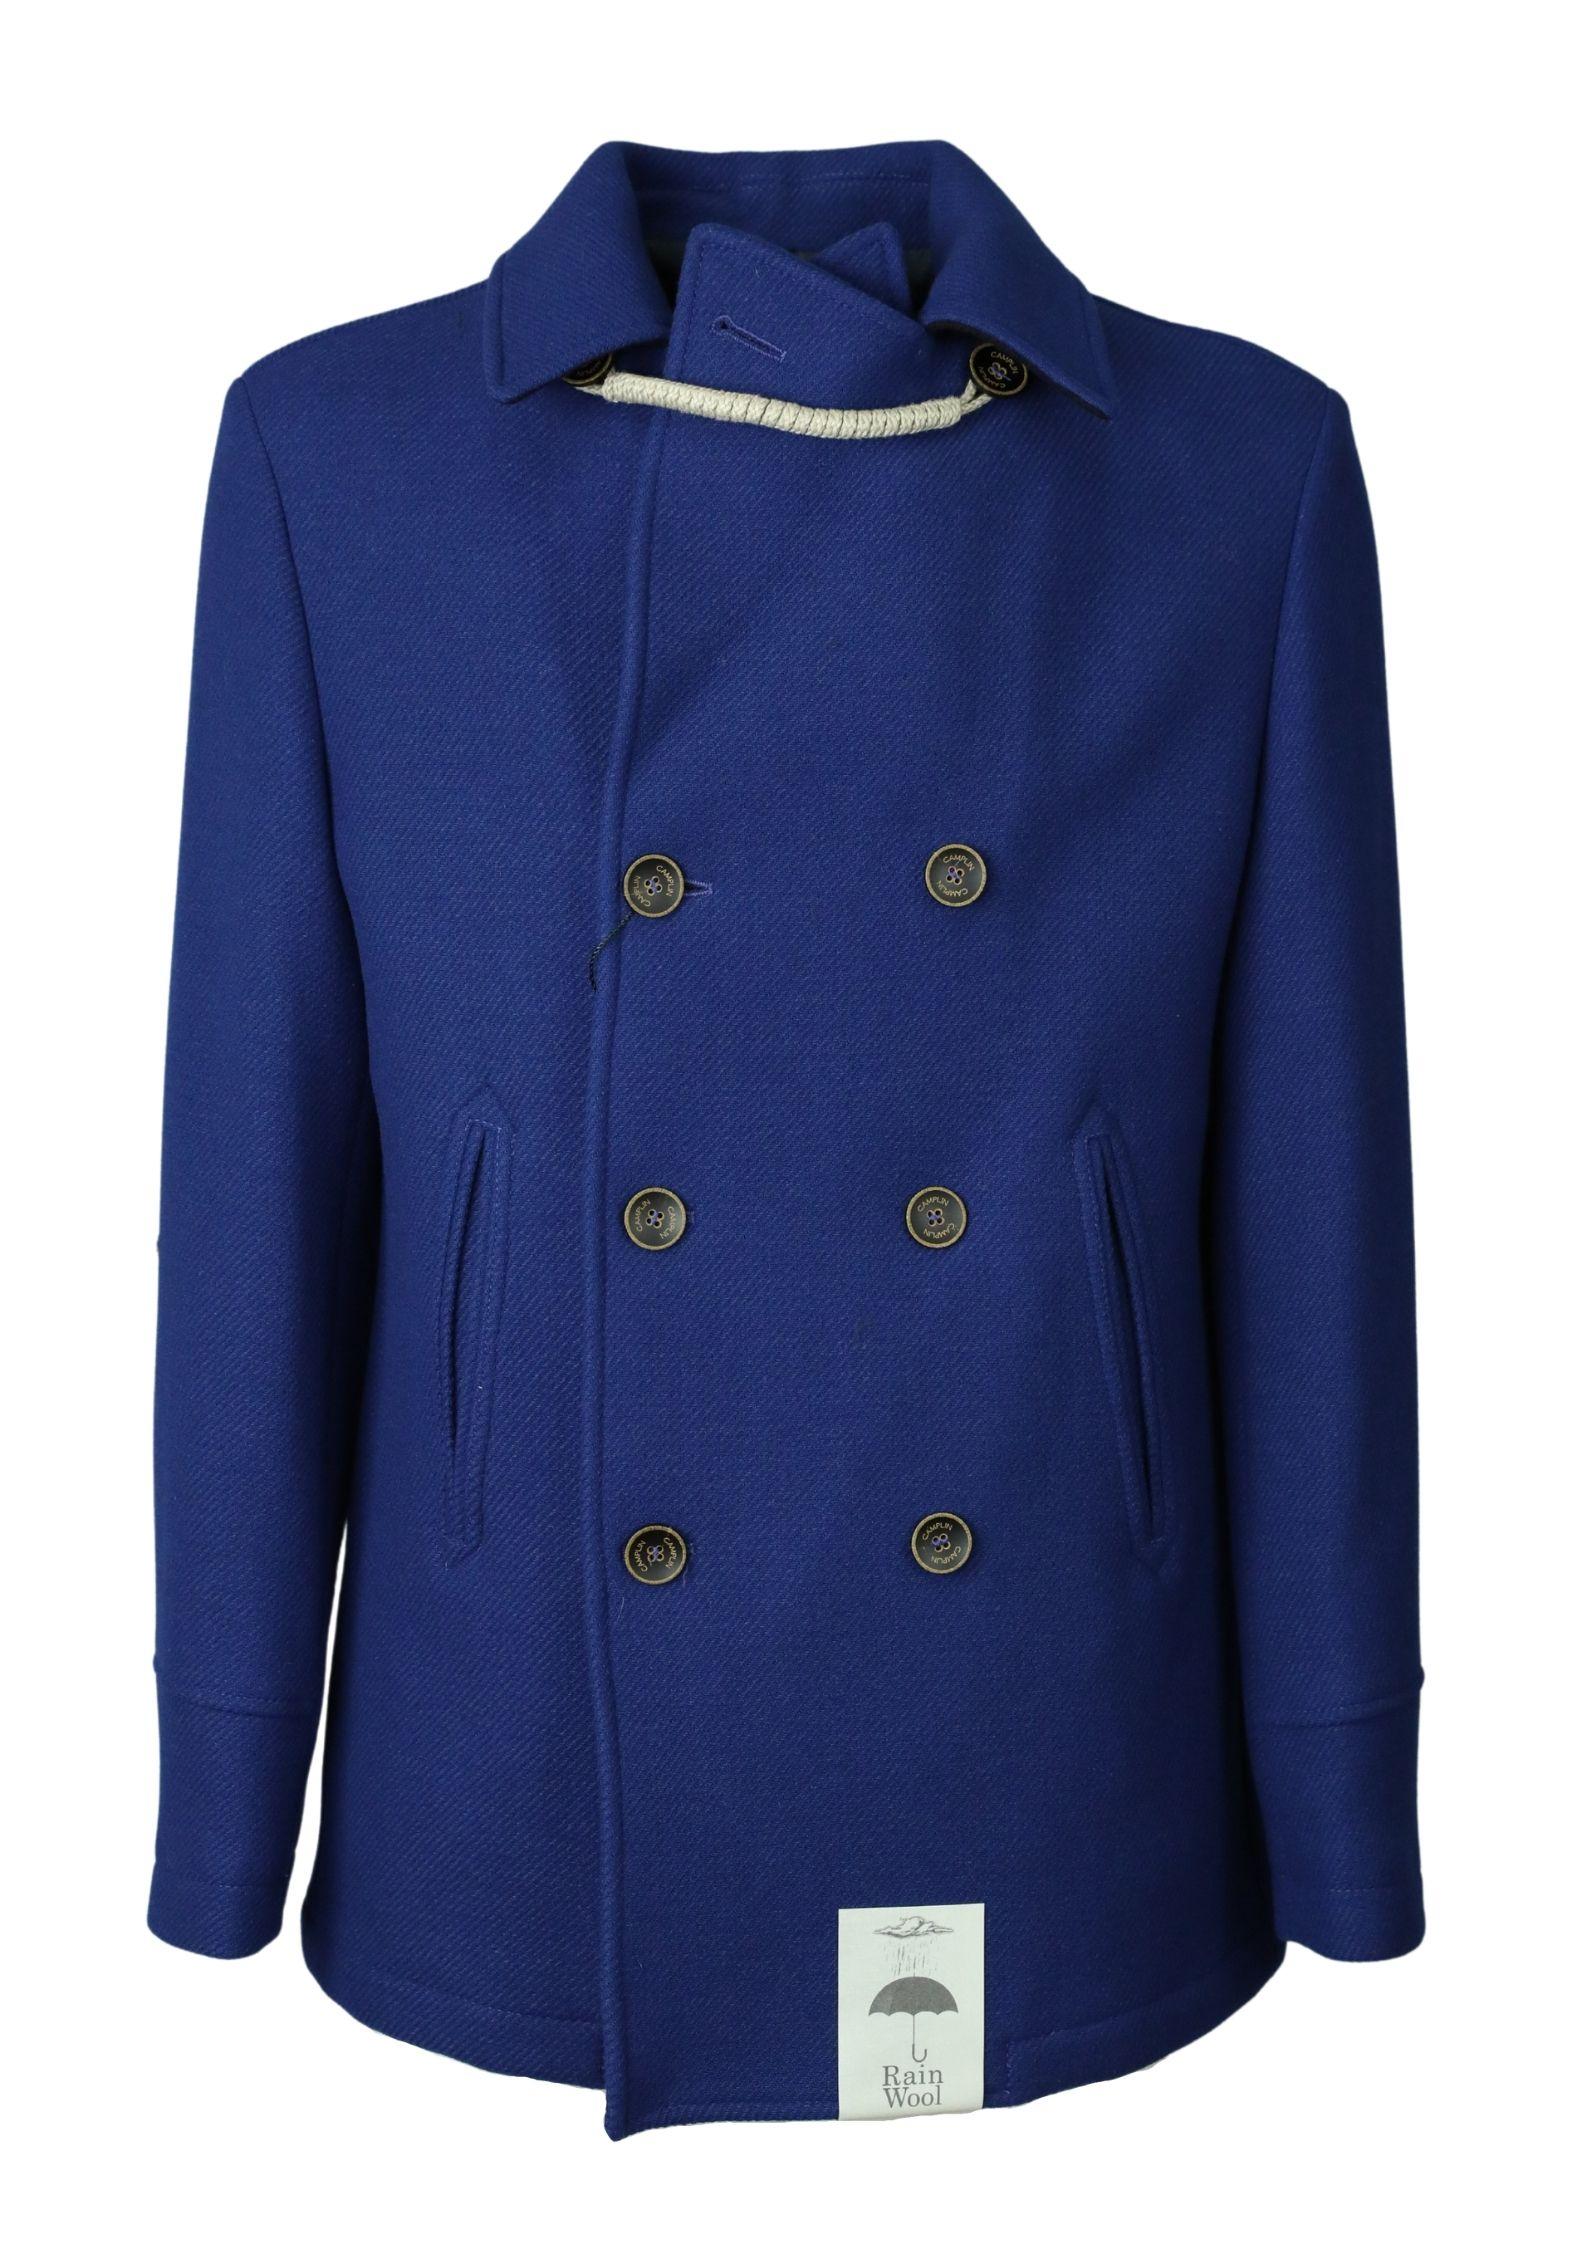 Doubl-breasted jacket CAMPLIN | Jackets | ISLANDRB S